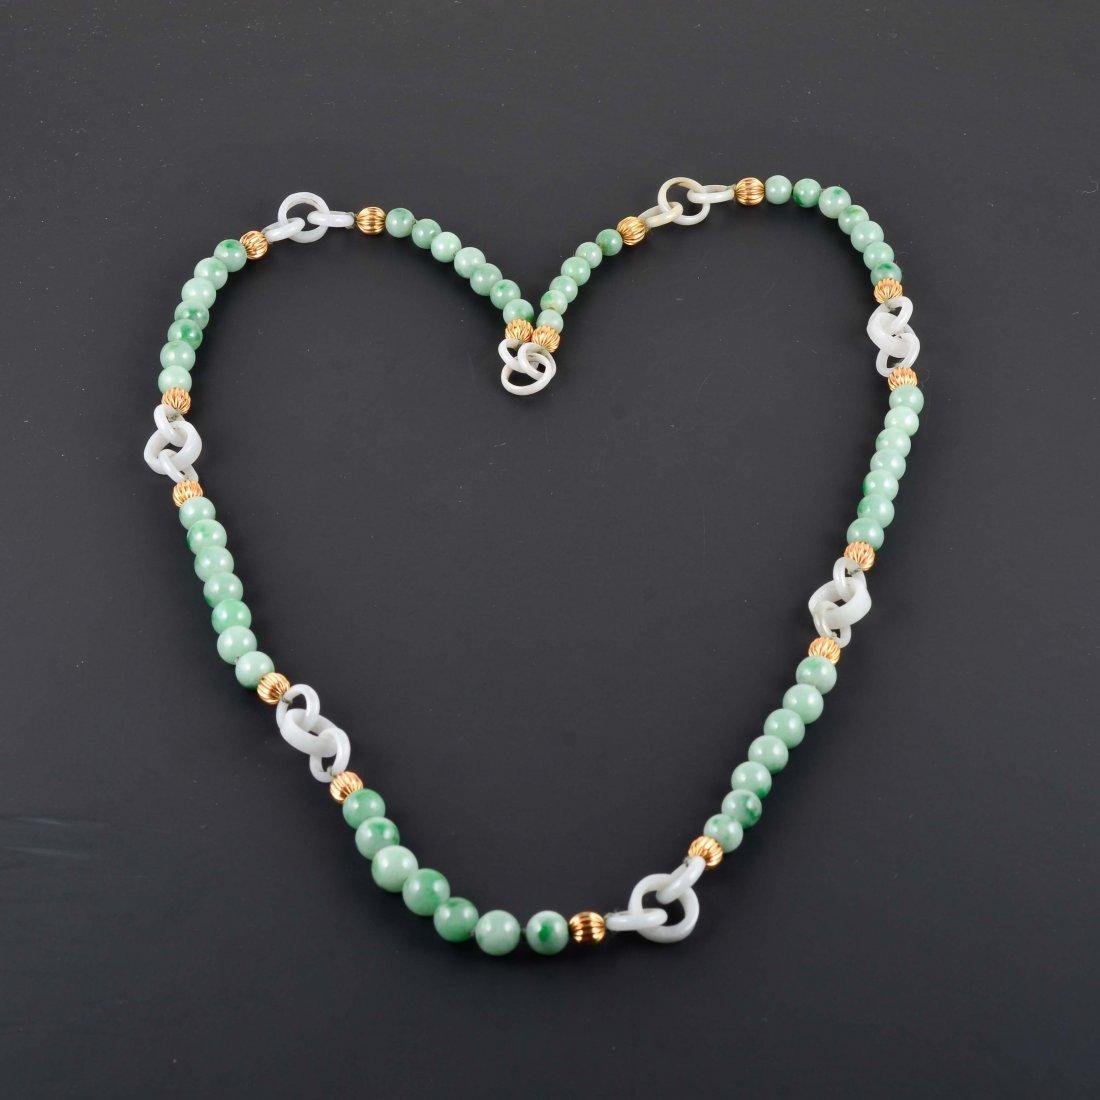 18K YG Jadeite Beads with white jade chain Necklace